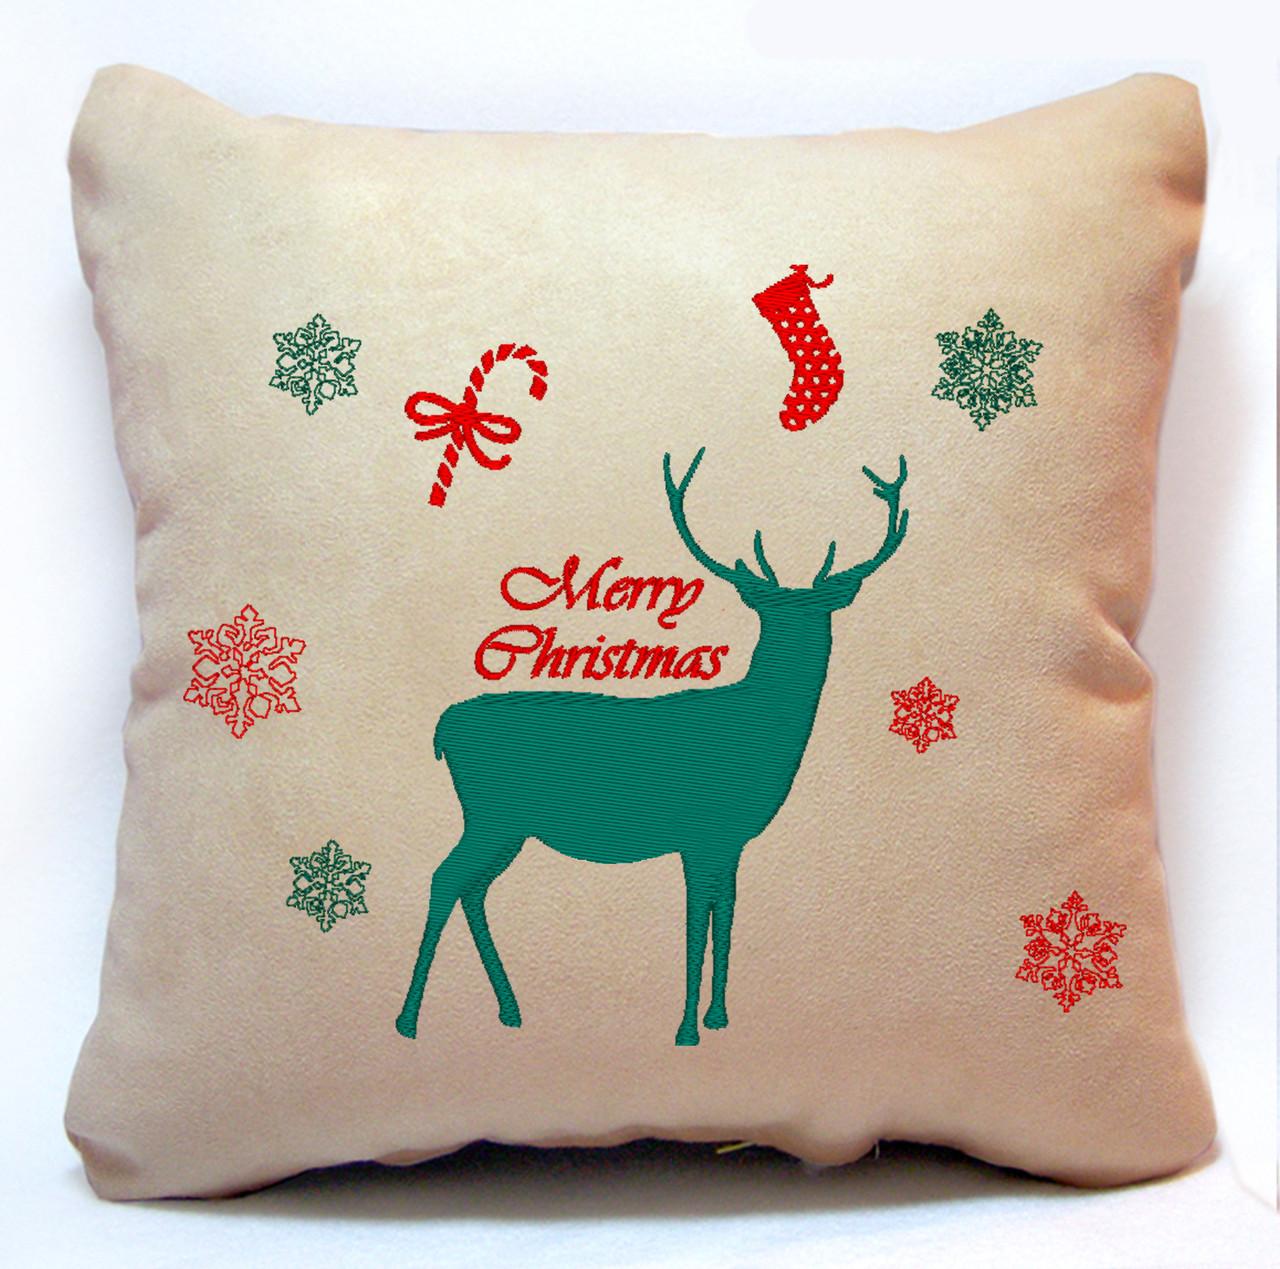 "Новорічна подушка ""Merry Christmas"" 26"